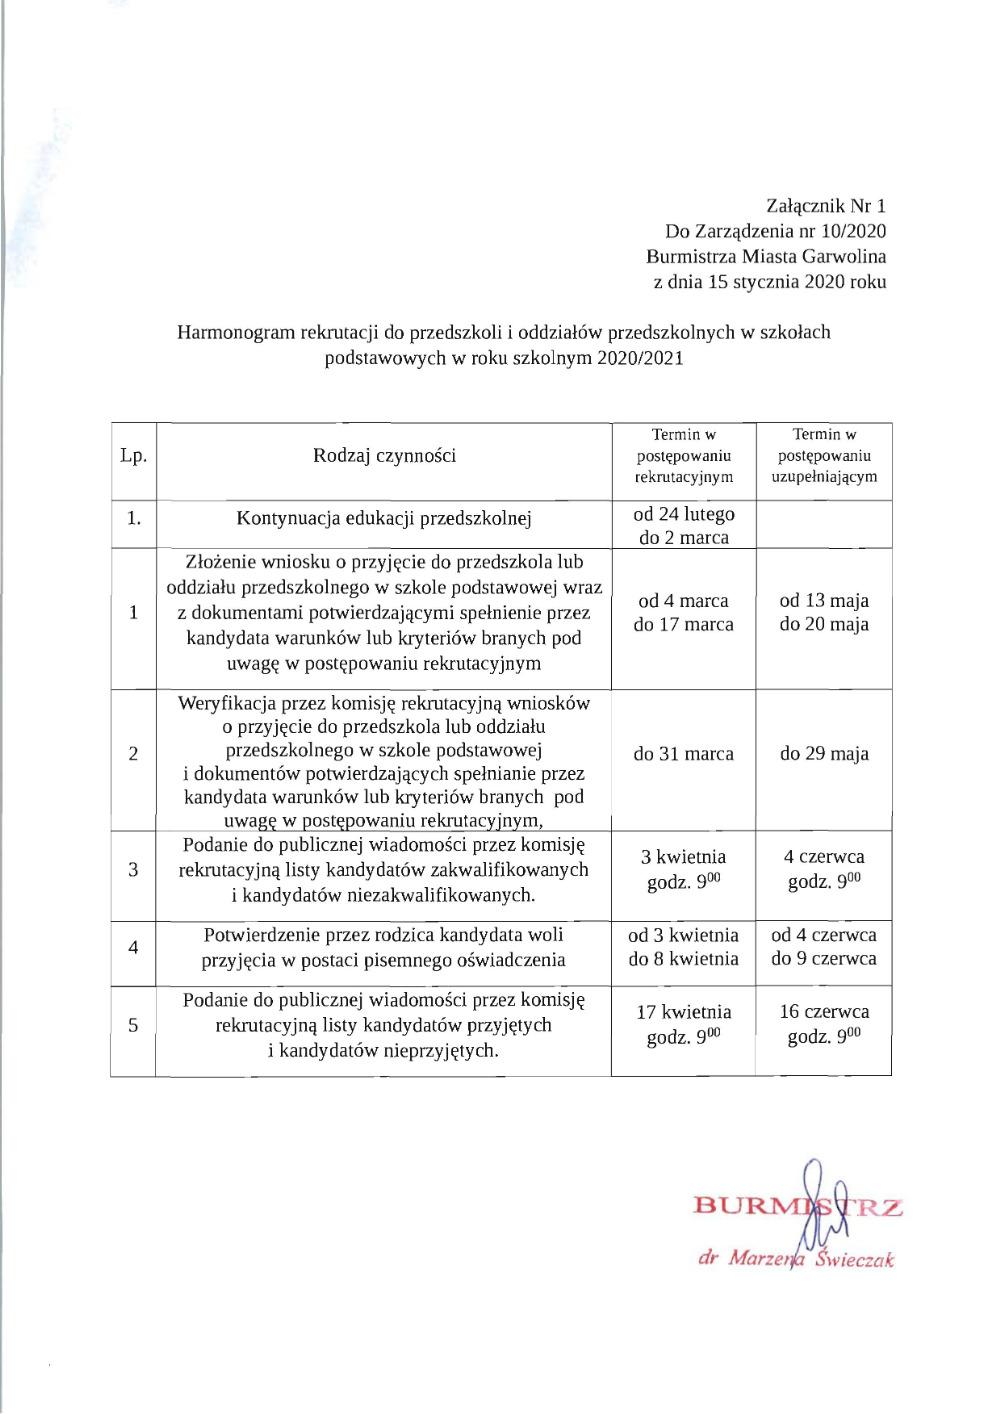 Harmonogram rekrutacji 2020-2021